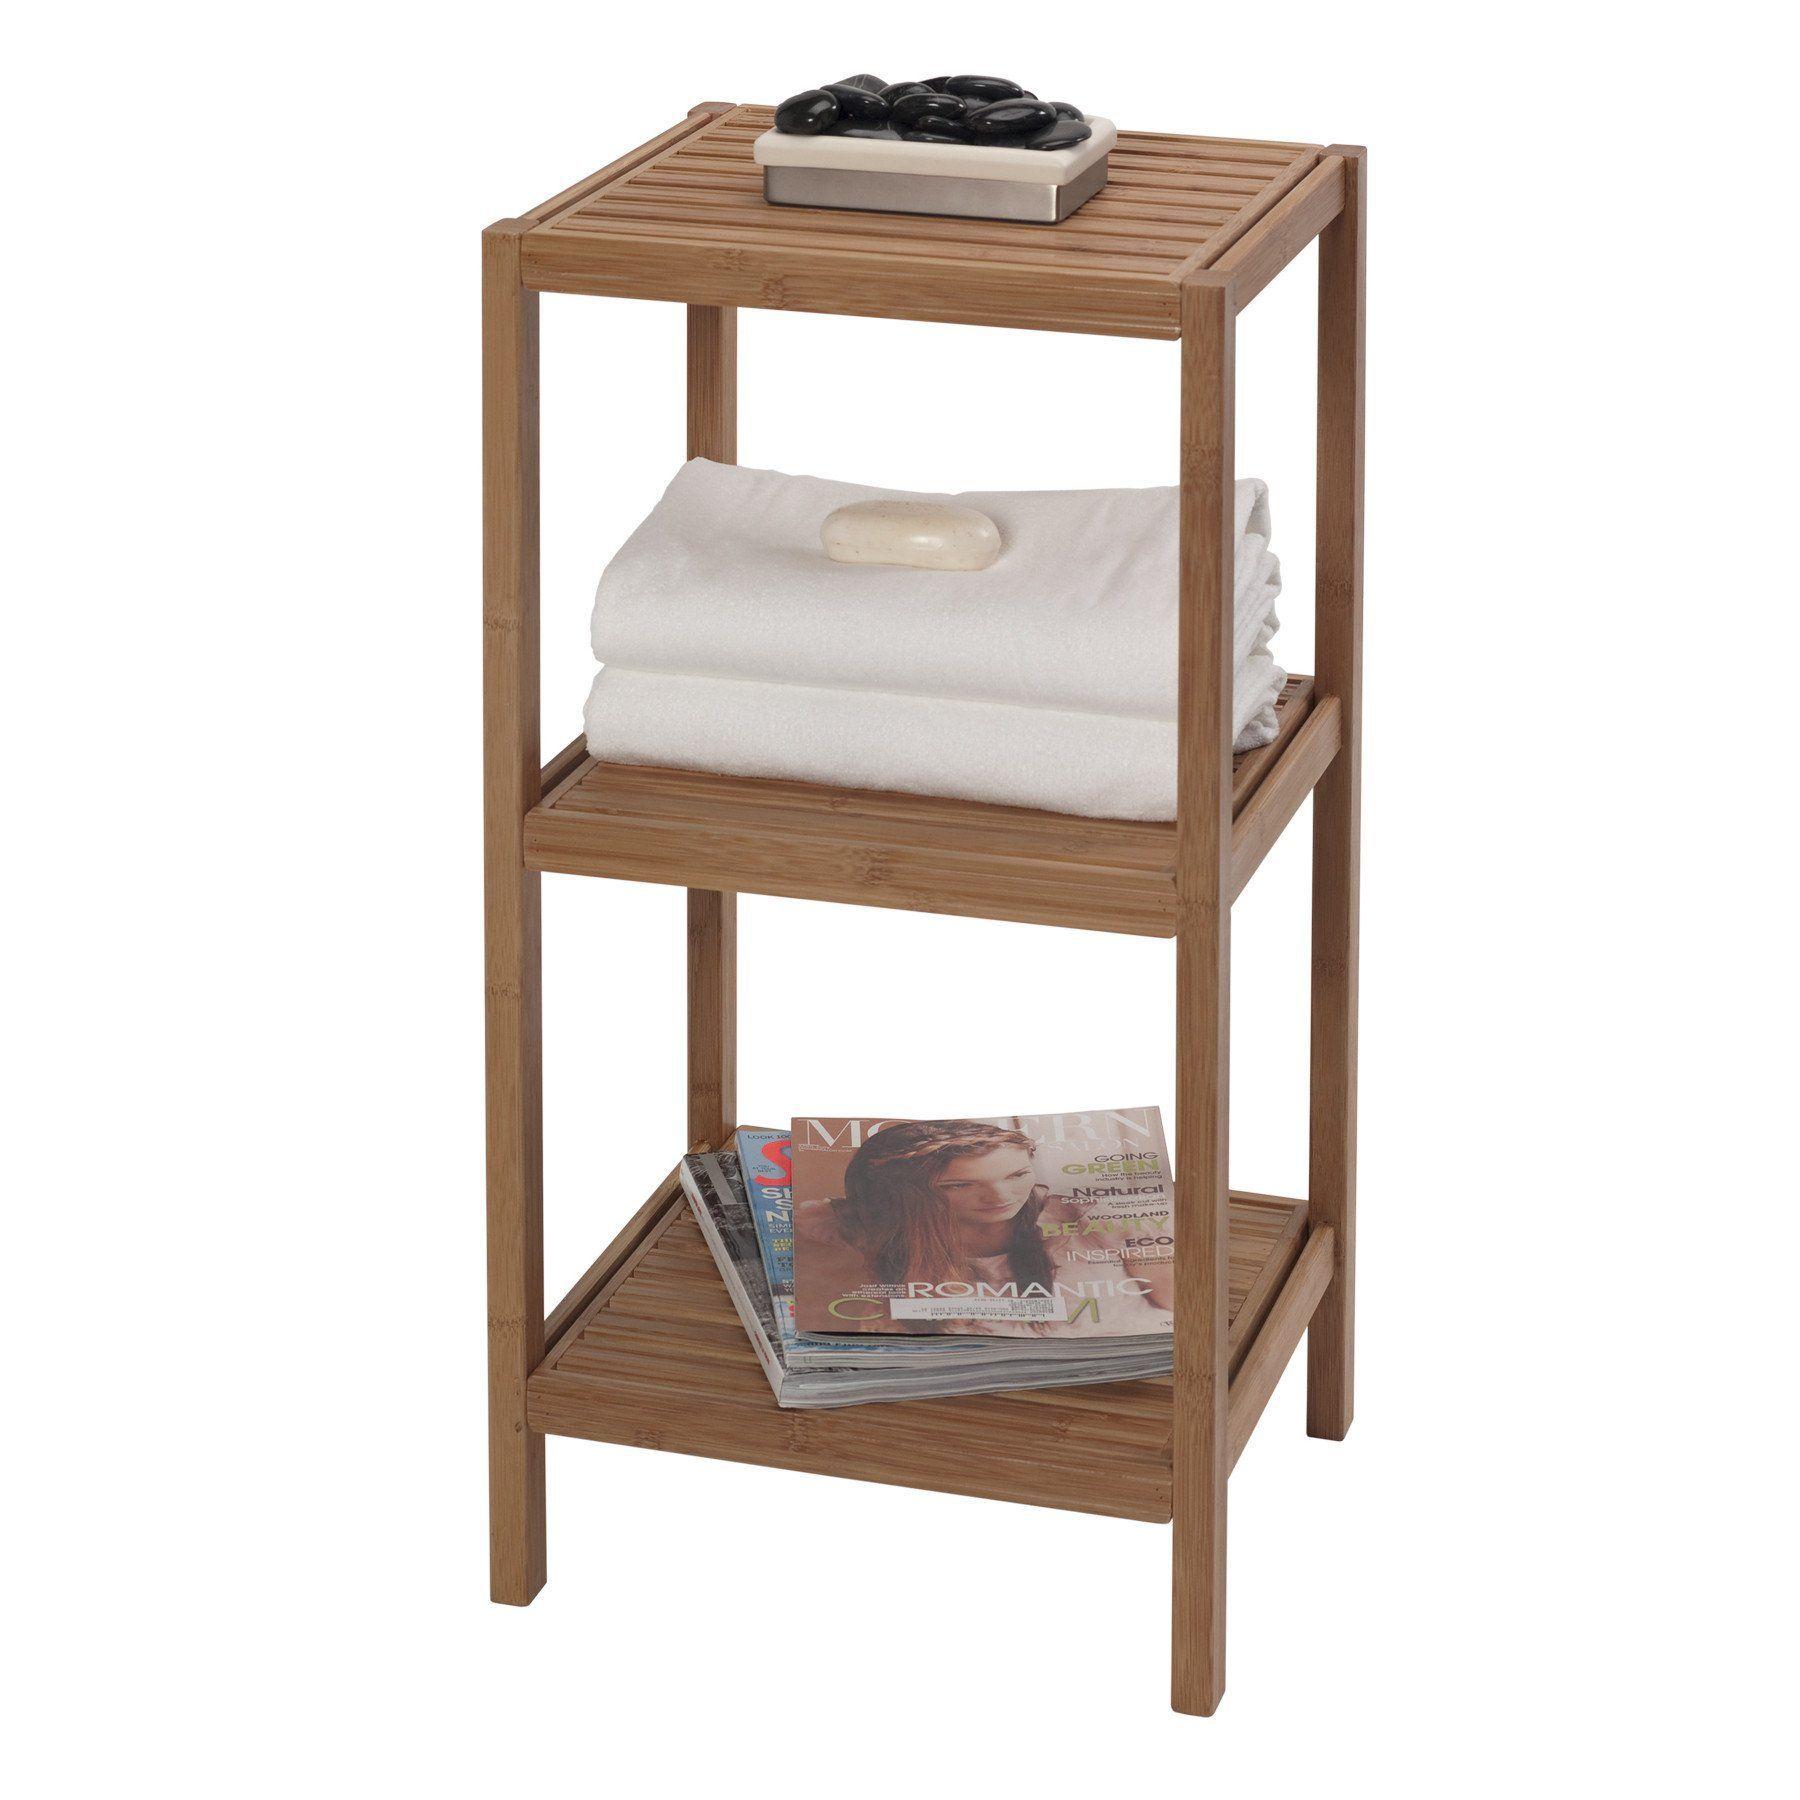 Bamboo bathroom shelf unit - Bamboo Bathroom Shelf Unit